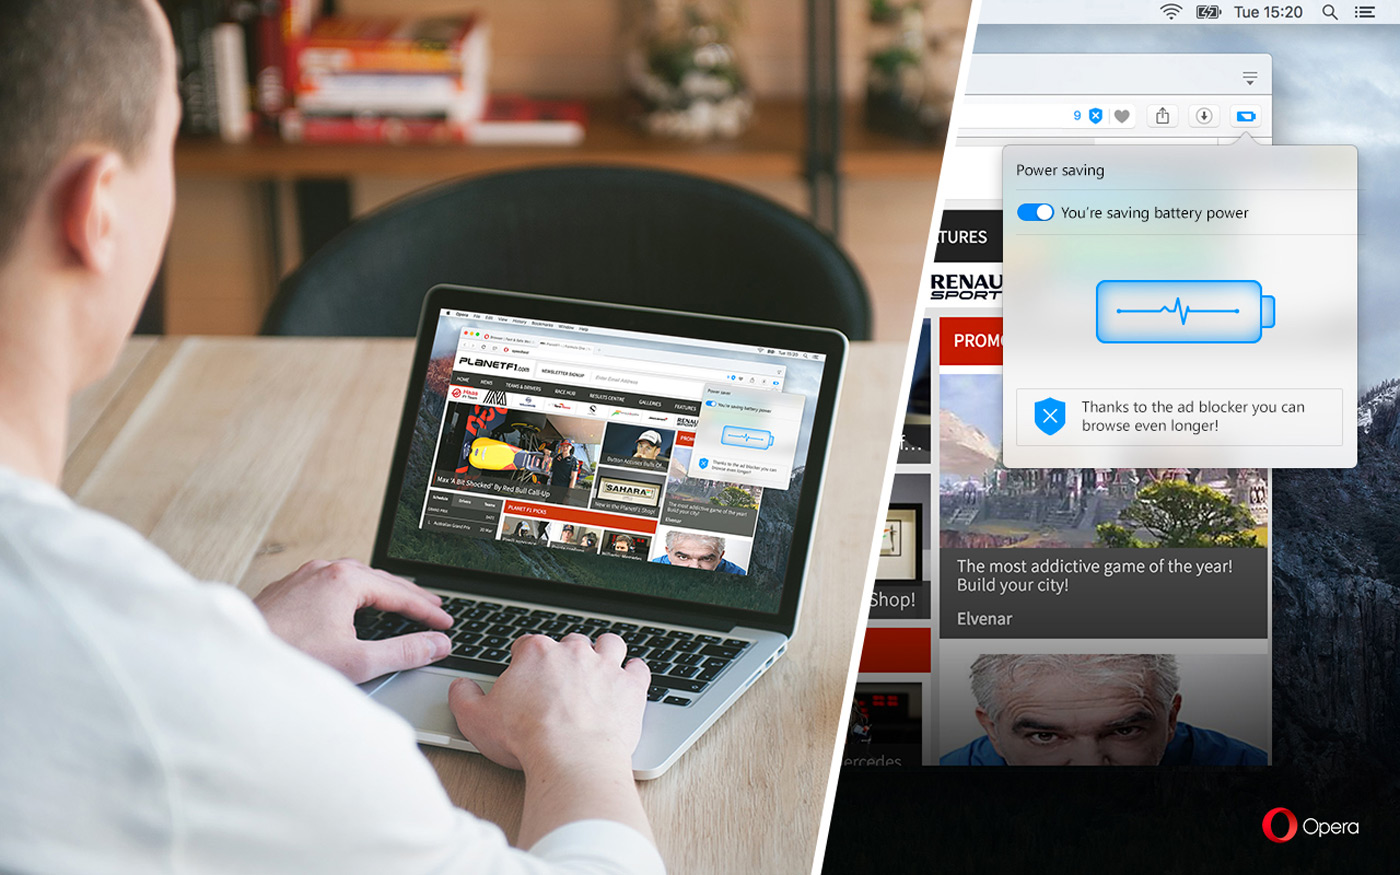 Opera's desktop web browser gets a low-power mode